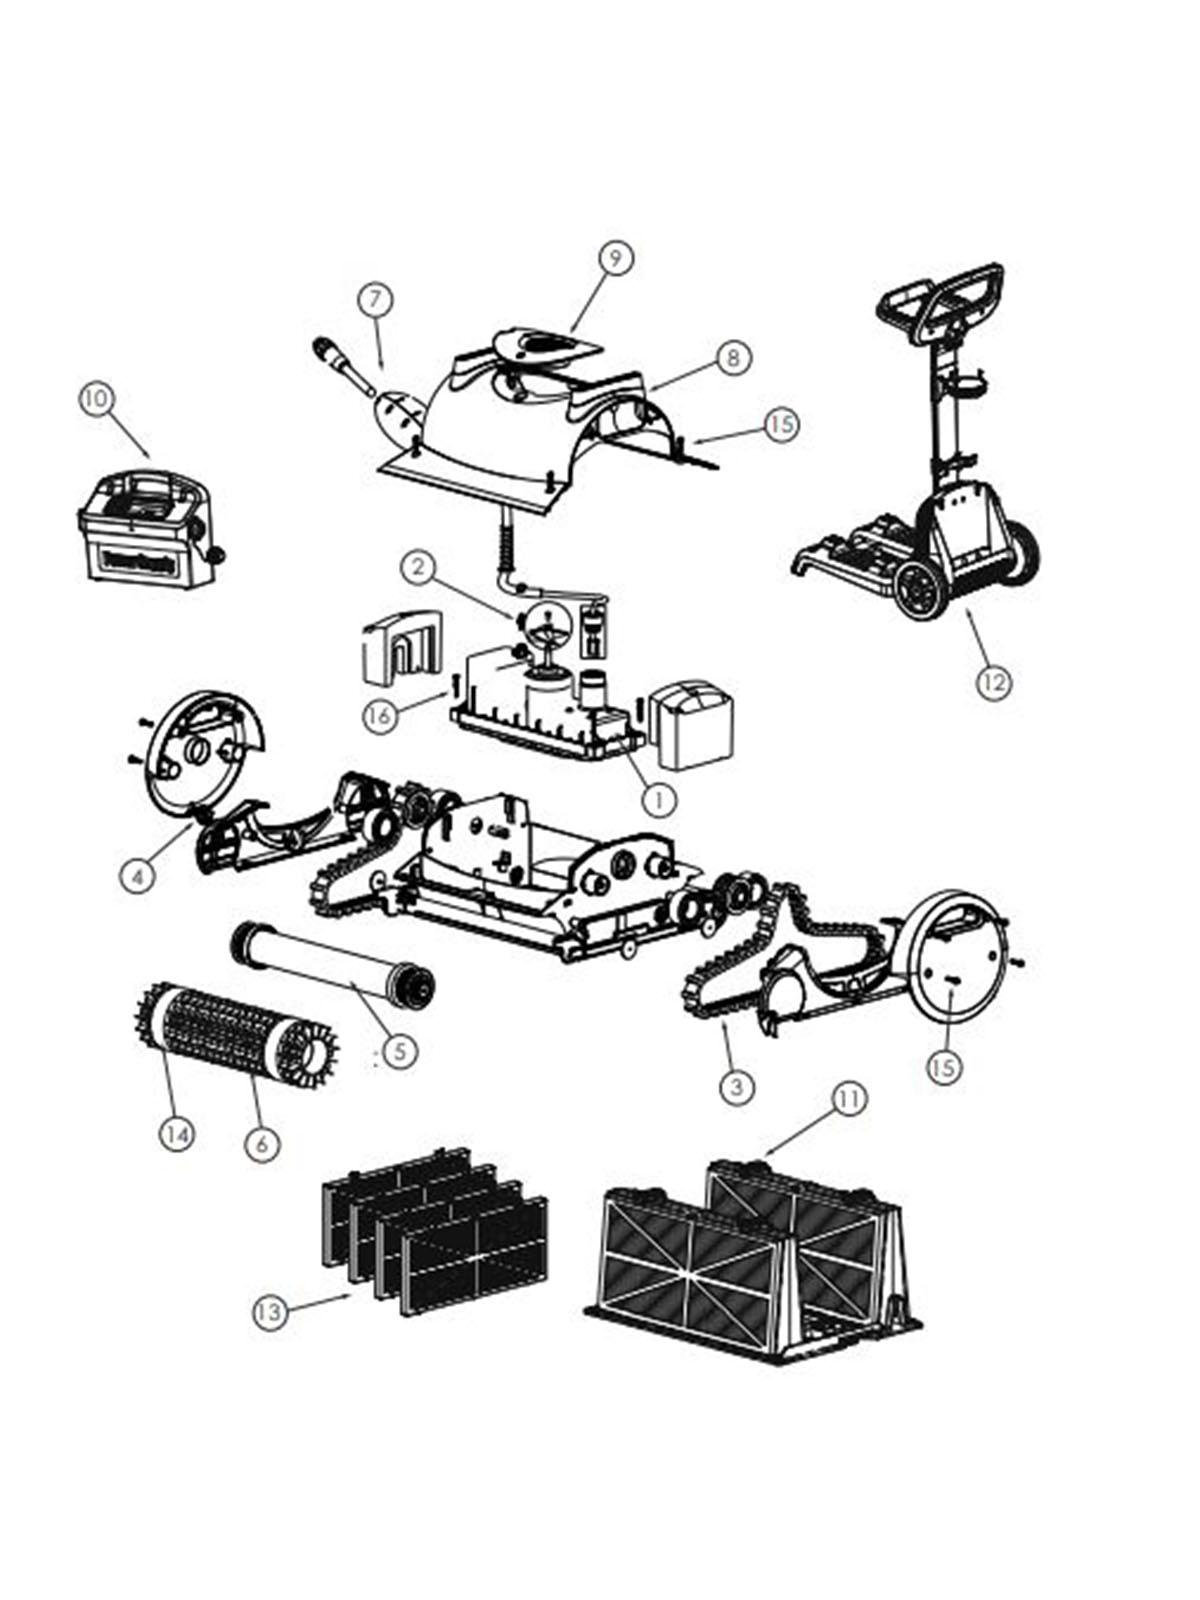 Pentair Kreepy Krauly Prowler 820 Robotic Automatic